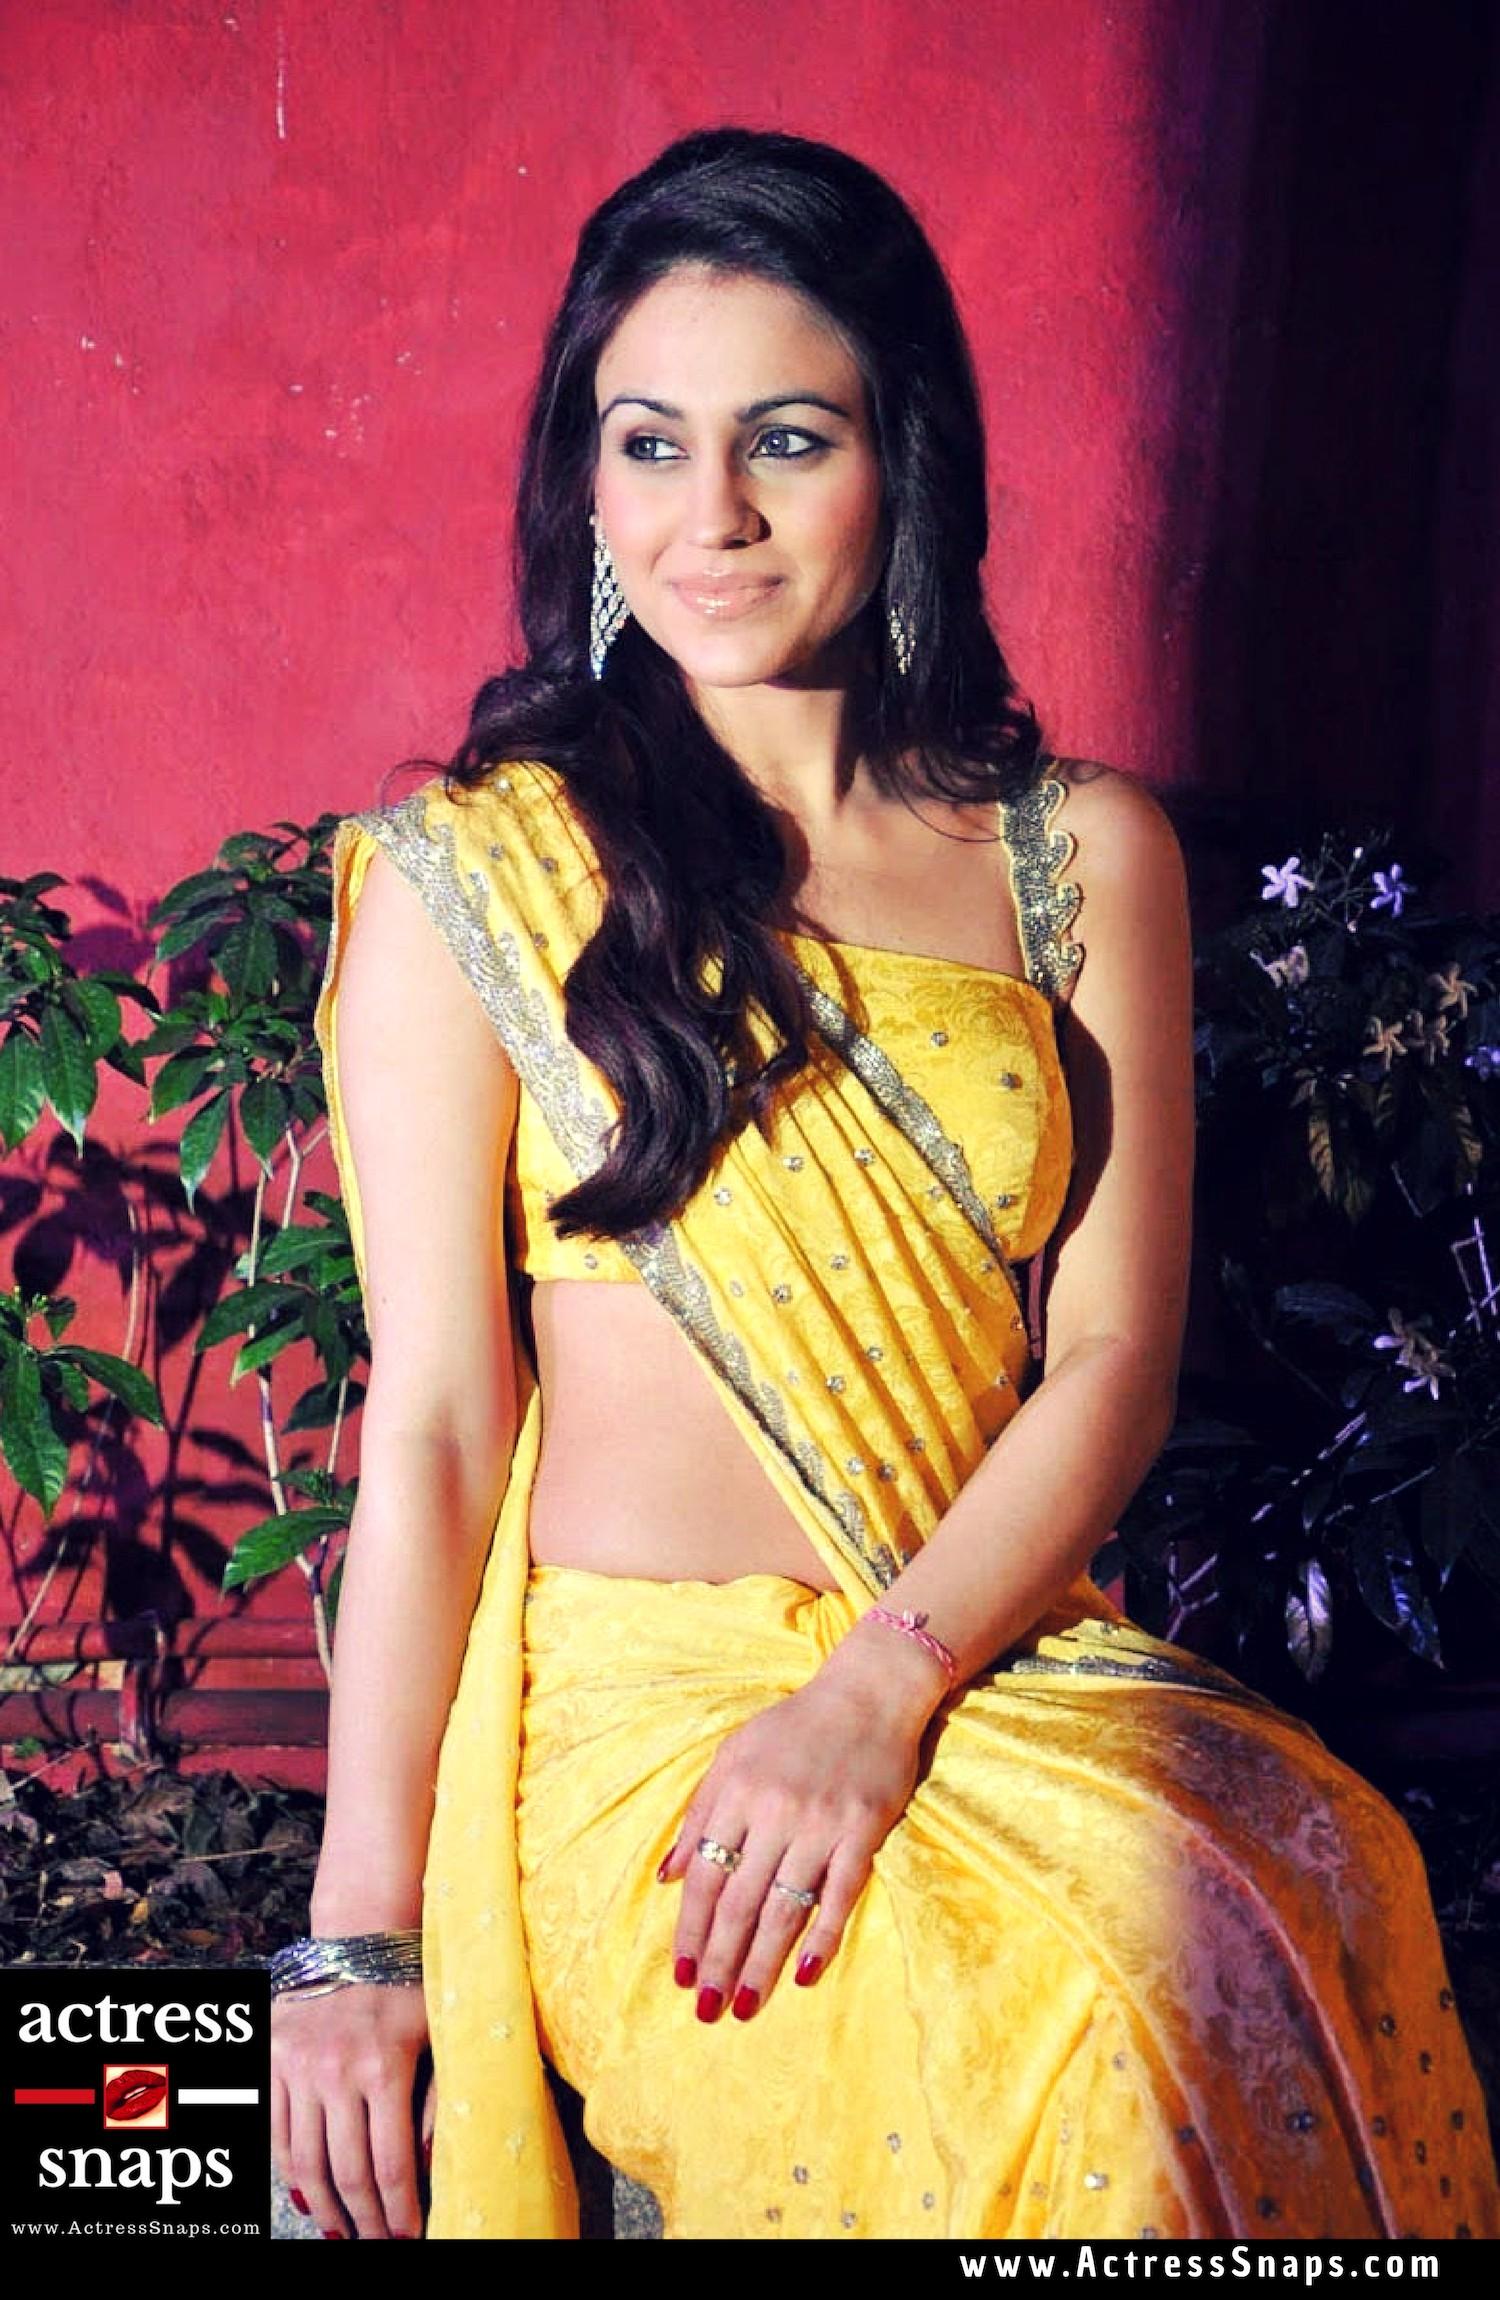 Sexy Aksha Pardasany Photos - Sexy Actress Pictures | Hot Actress Pictures - ActressSnaps.com